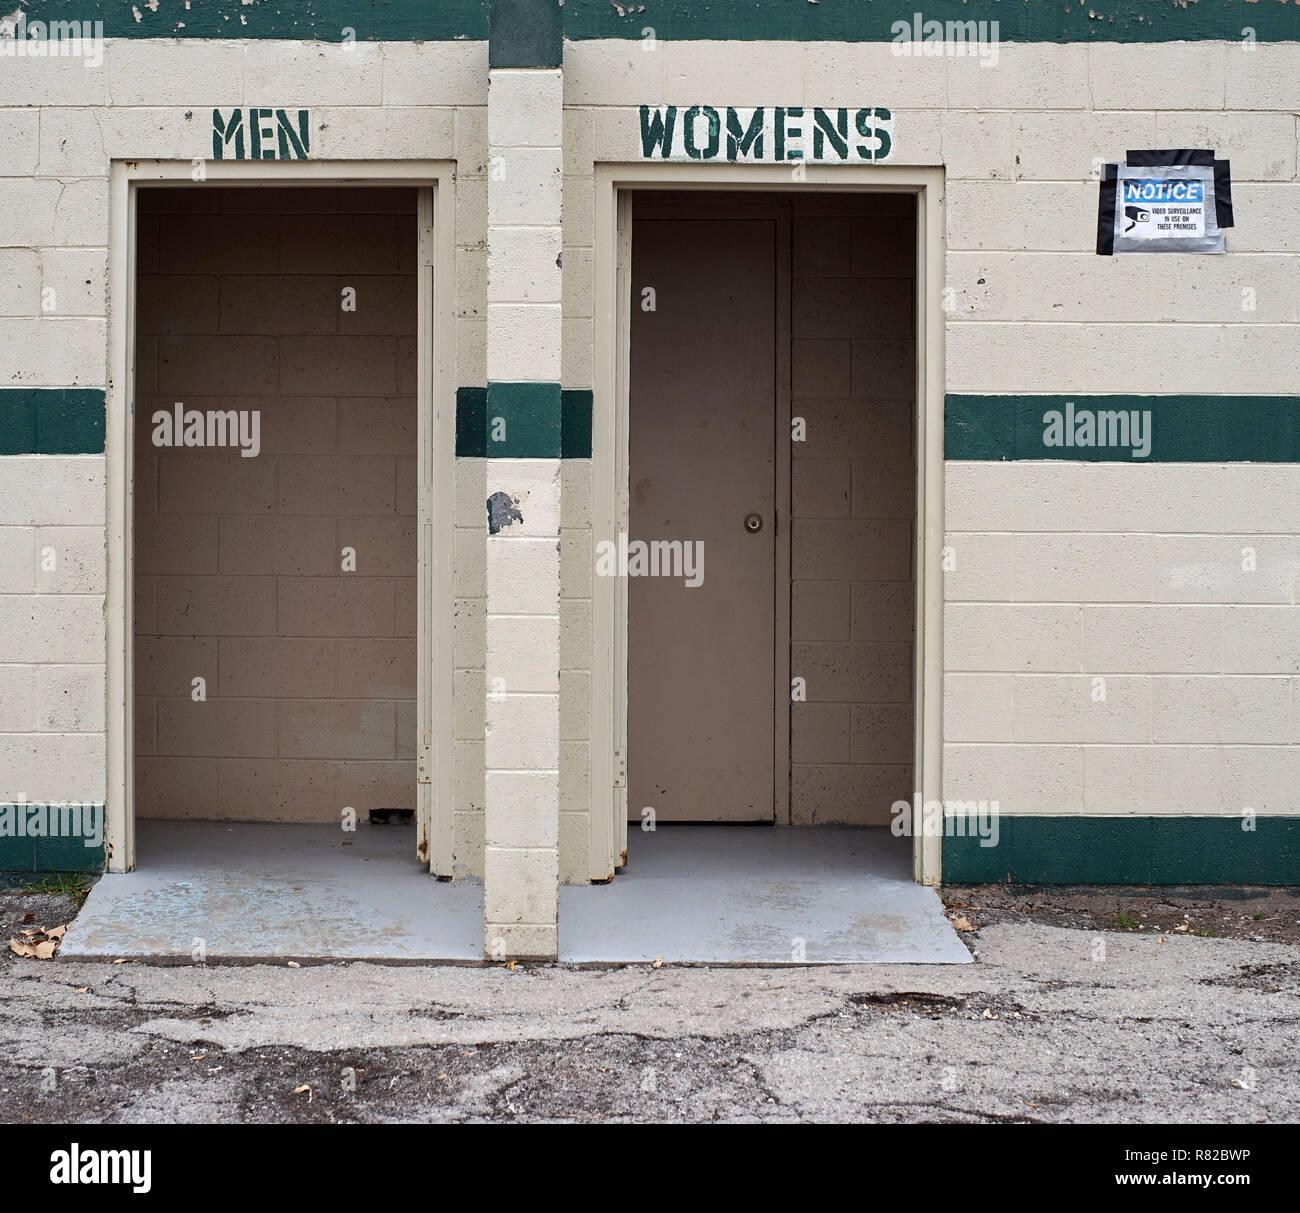 Misspelled public toilets in Alpine, Texas - Stock Image